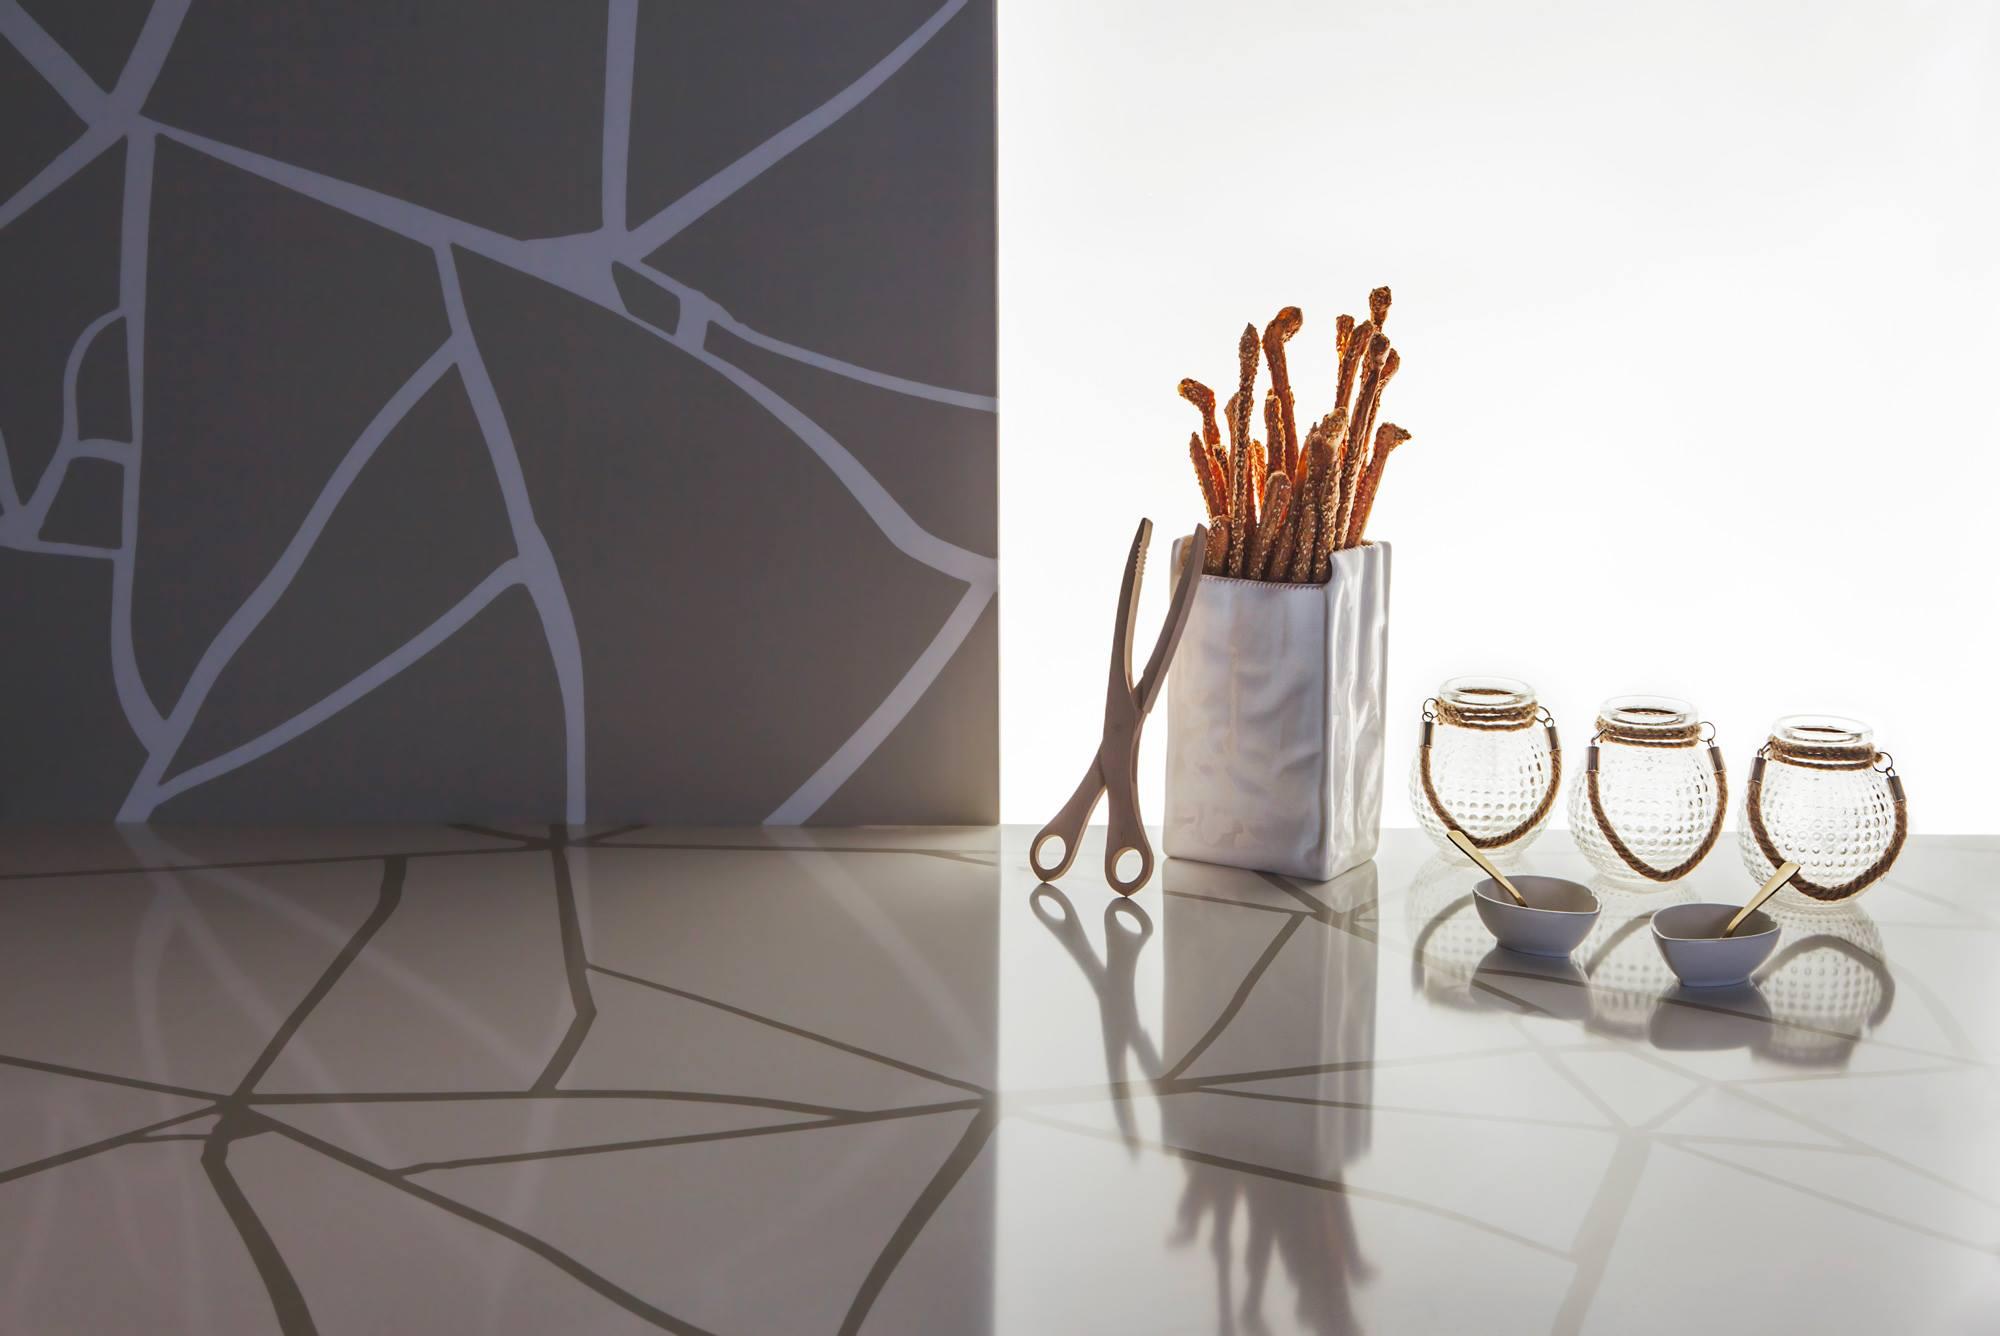 Craken Stone Italiana Partner Abdeckplatten Tresen Theken Verkleidung